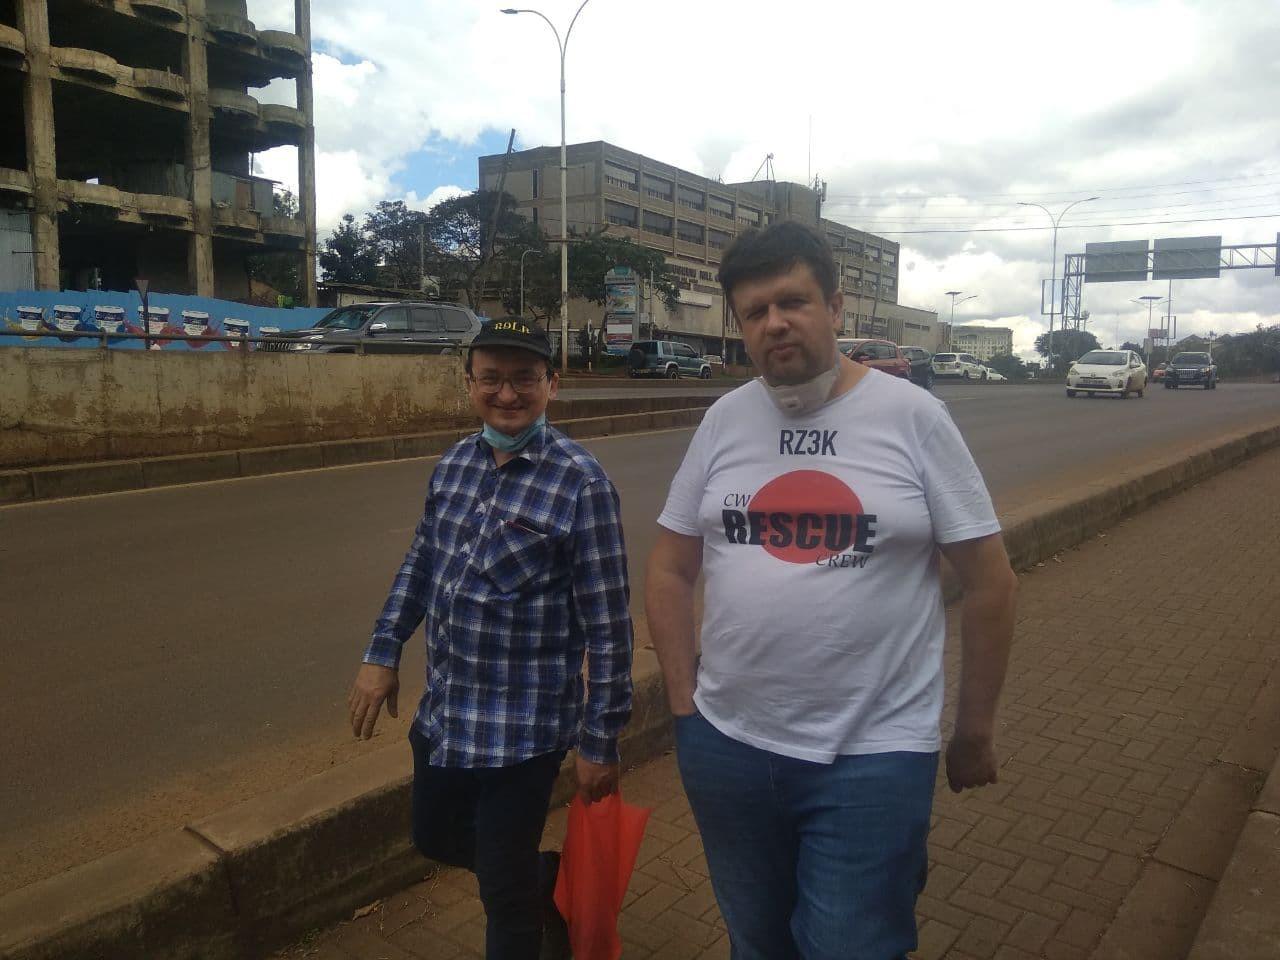 7Q7RU Nairobi, Kenya 9 November 2020 Image 1